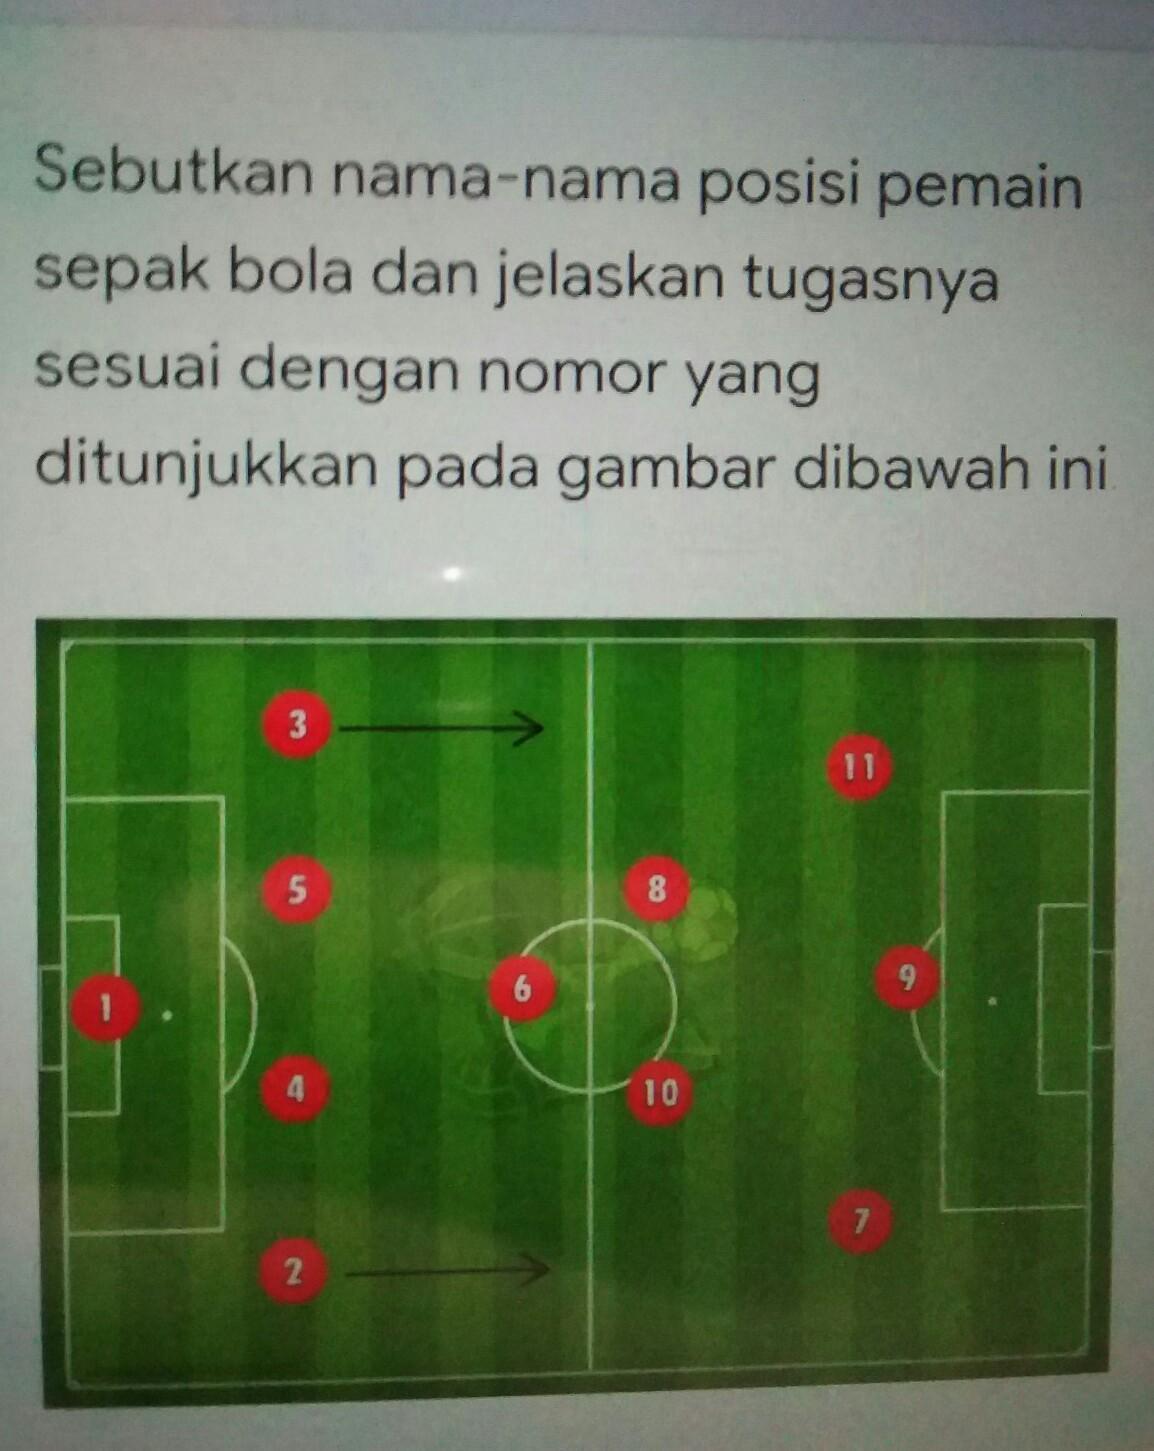 Tugas Pemain Sepak Bola : tugas, pemain, sepak, Sebutkan, Posisi, Pemain, Sepak, Jelaskan, Tugasnya, Sesuai, Nomor, Ditunjukkan, Brainly.co.id